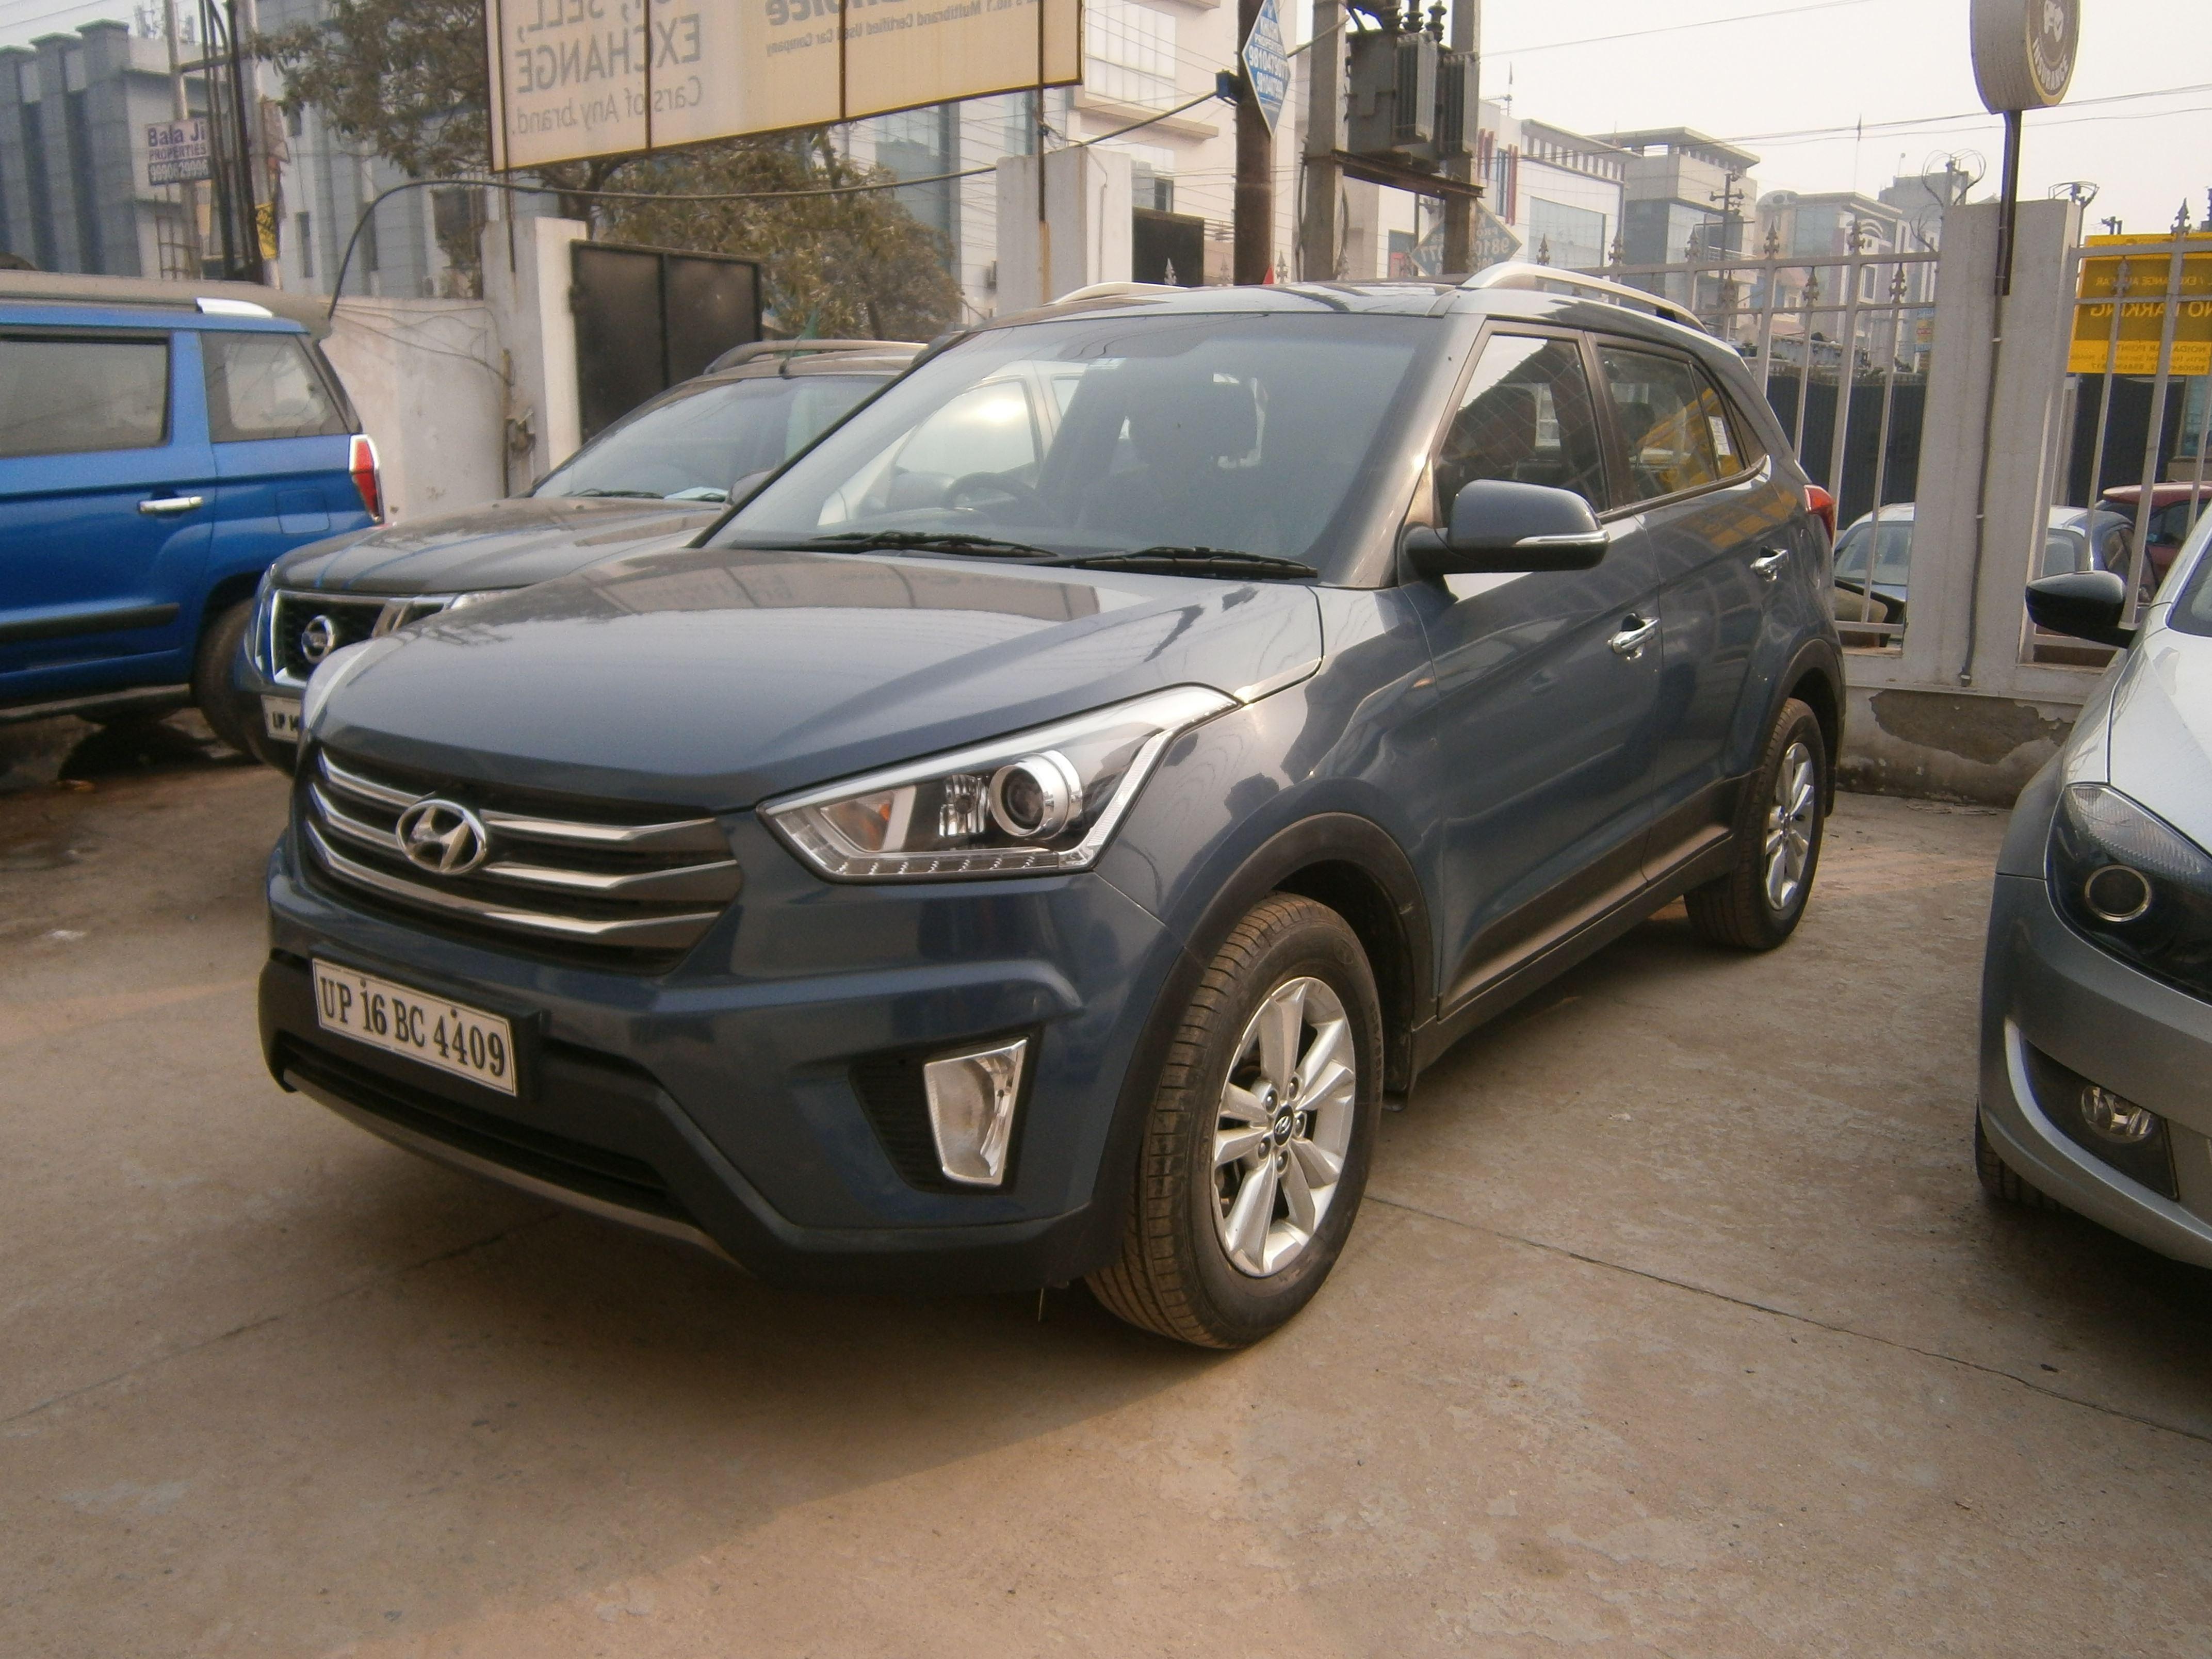 Used Hyundai Creta In Delhi Used Cars In Delhi Mahindra First